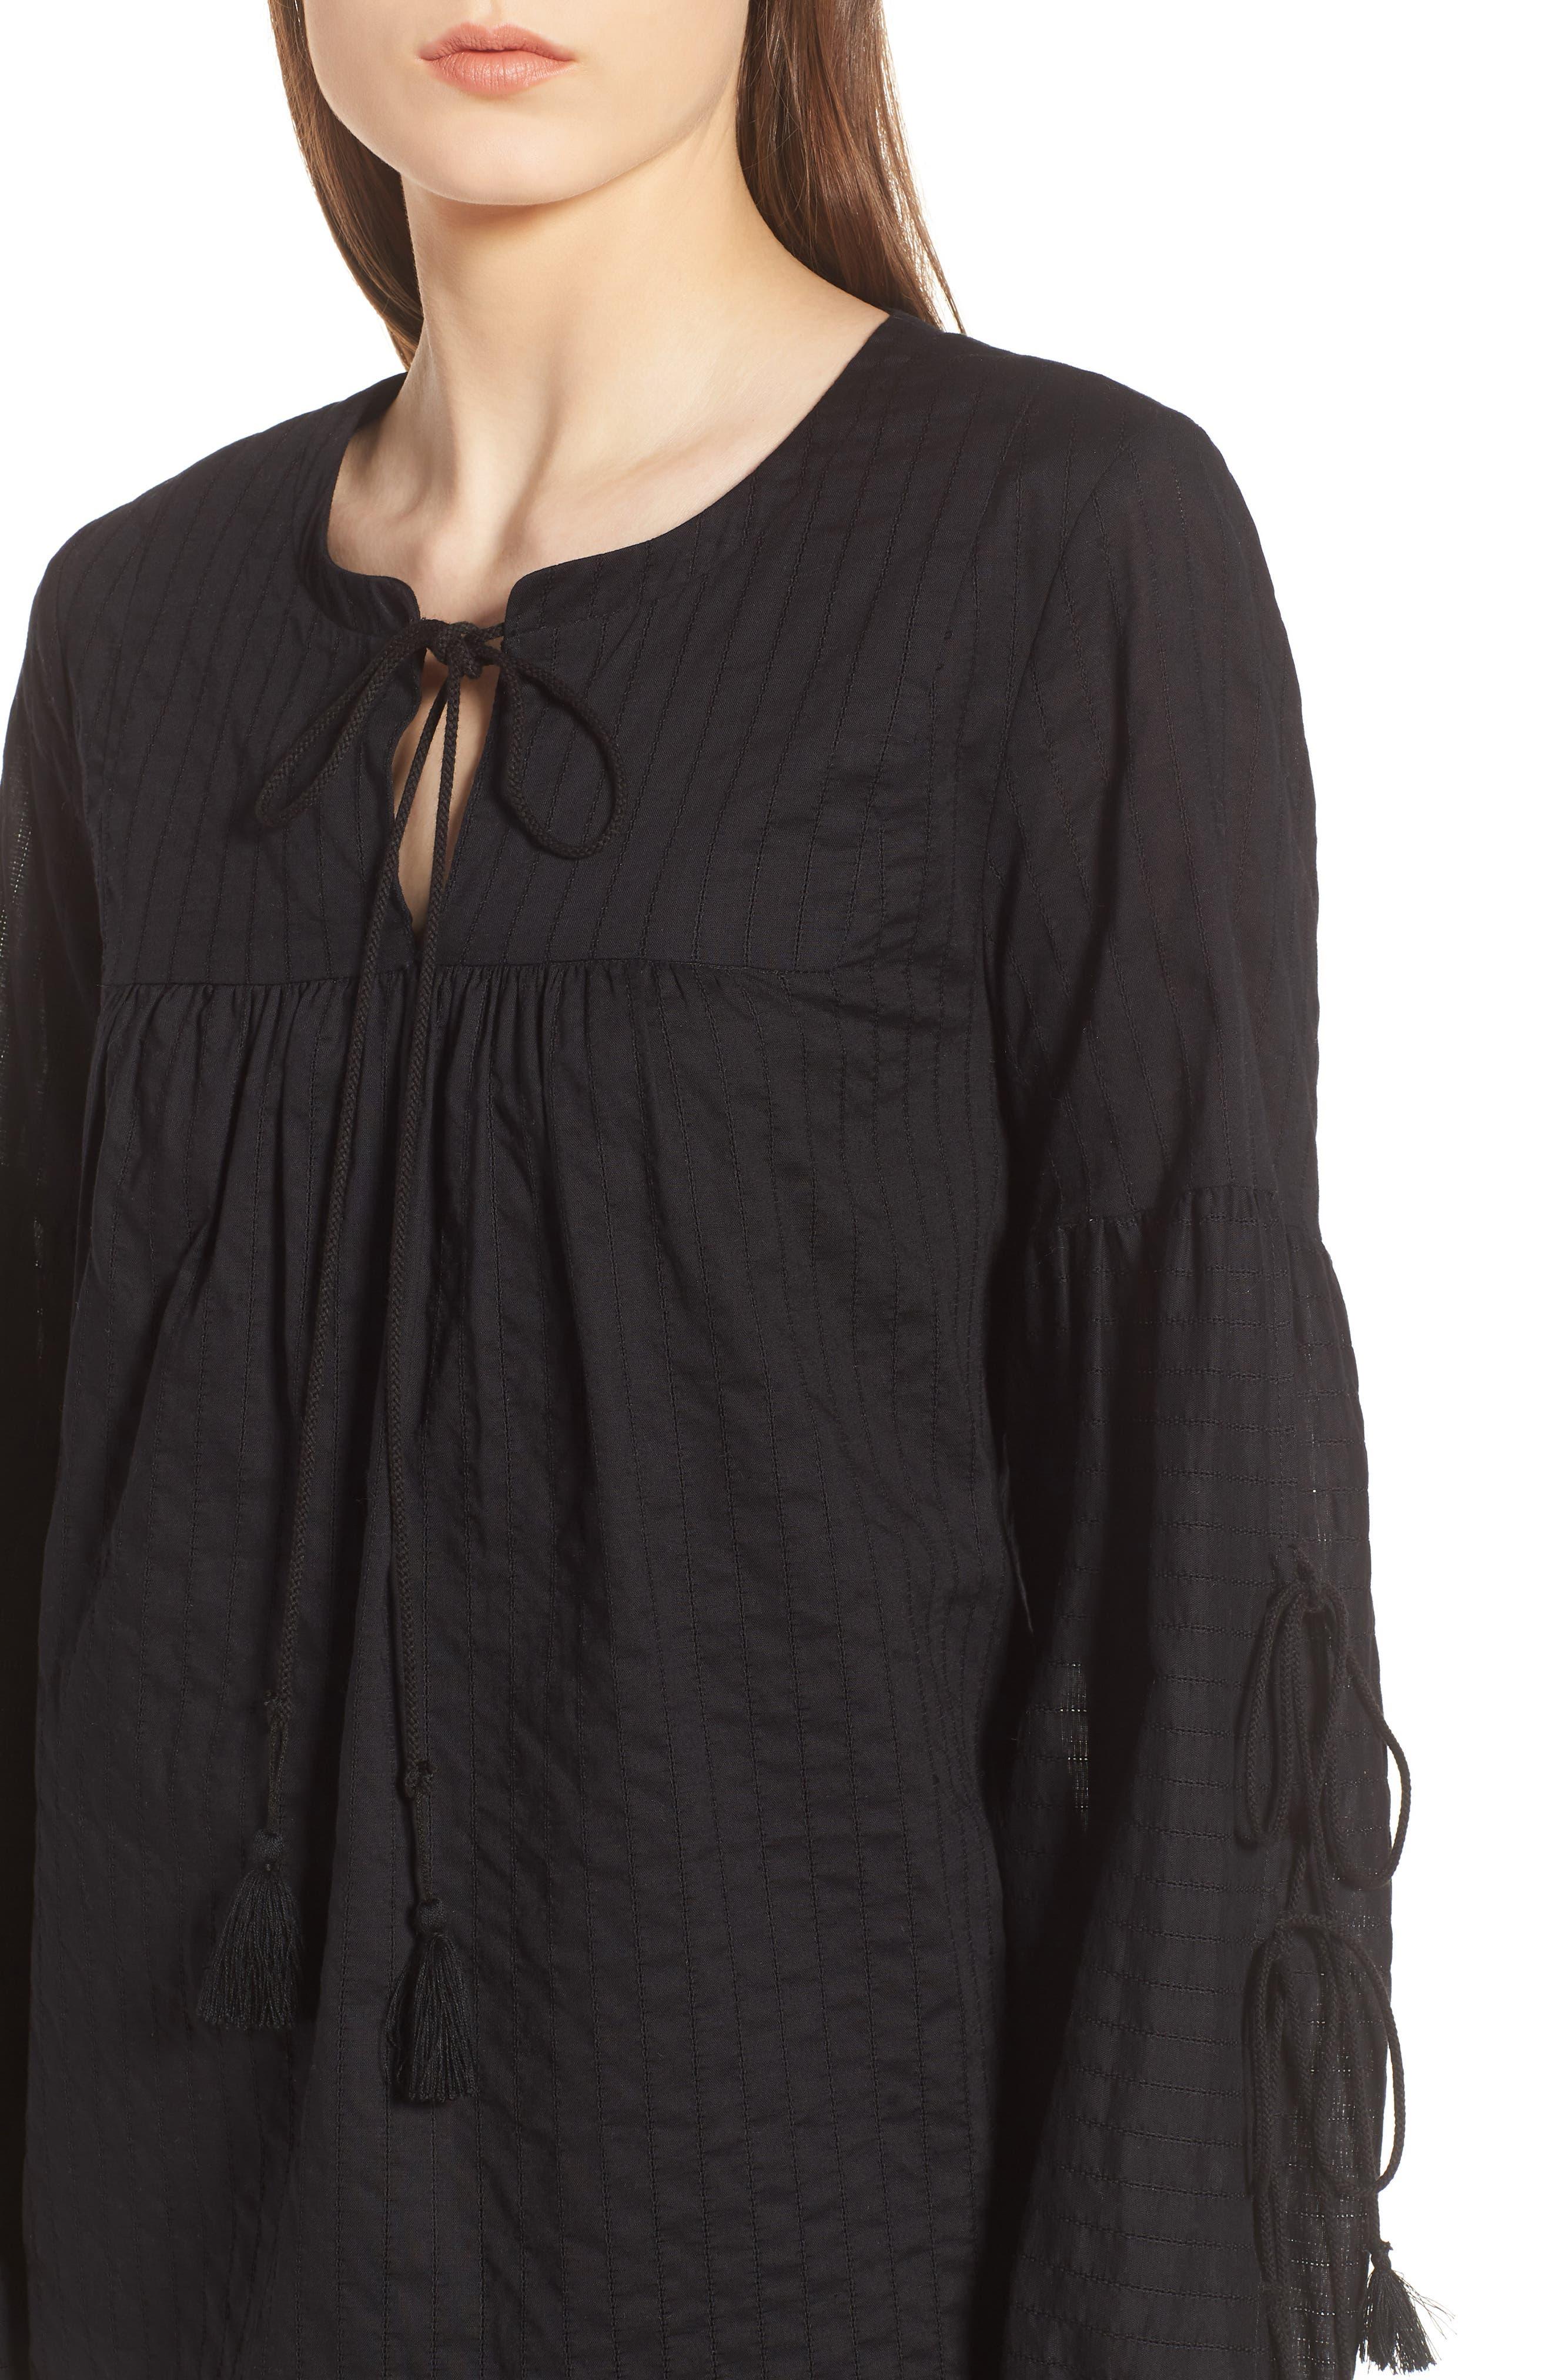 Dolly Dress,                             Alternate thumbnail 4, color,                             001